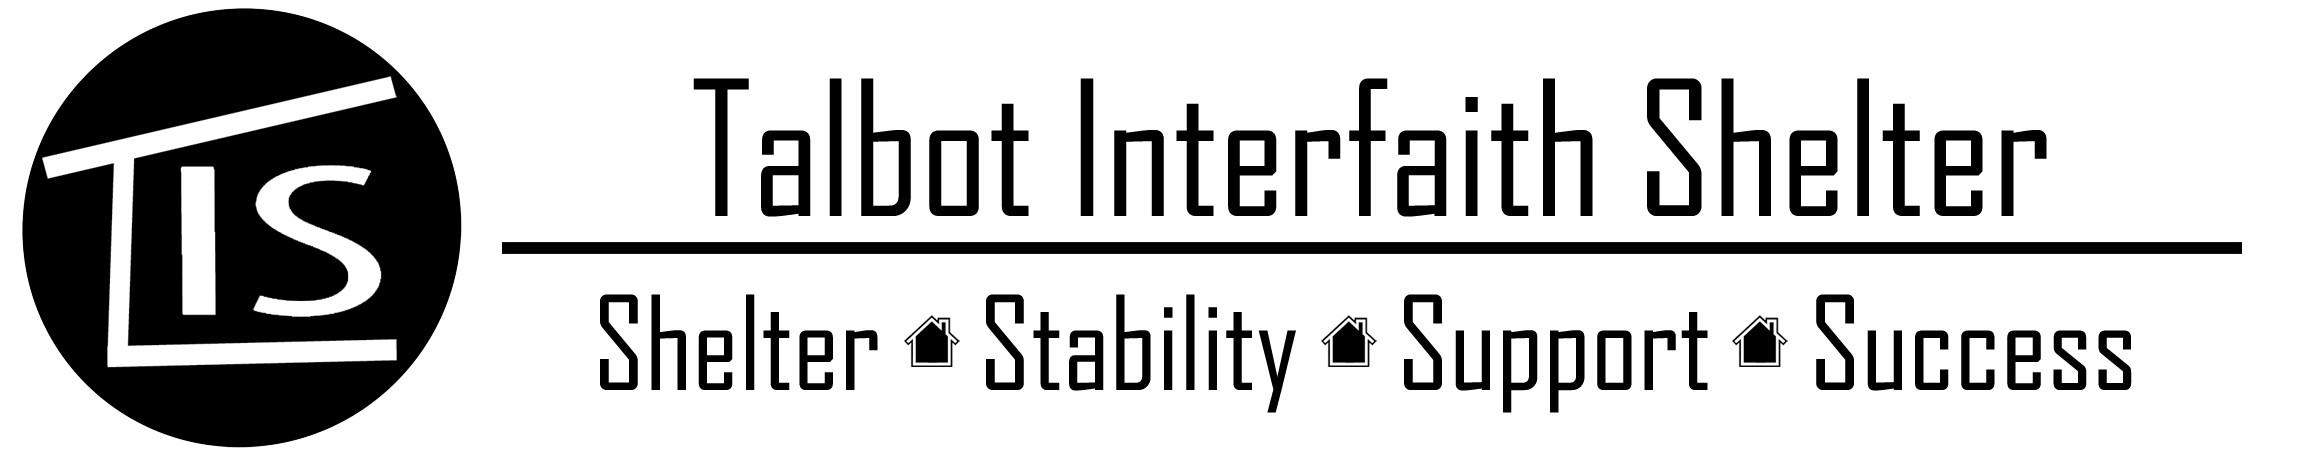 Talbot Interfaith Shelter logo